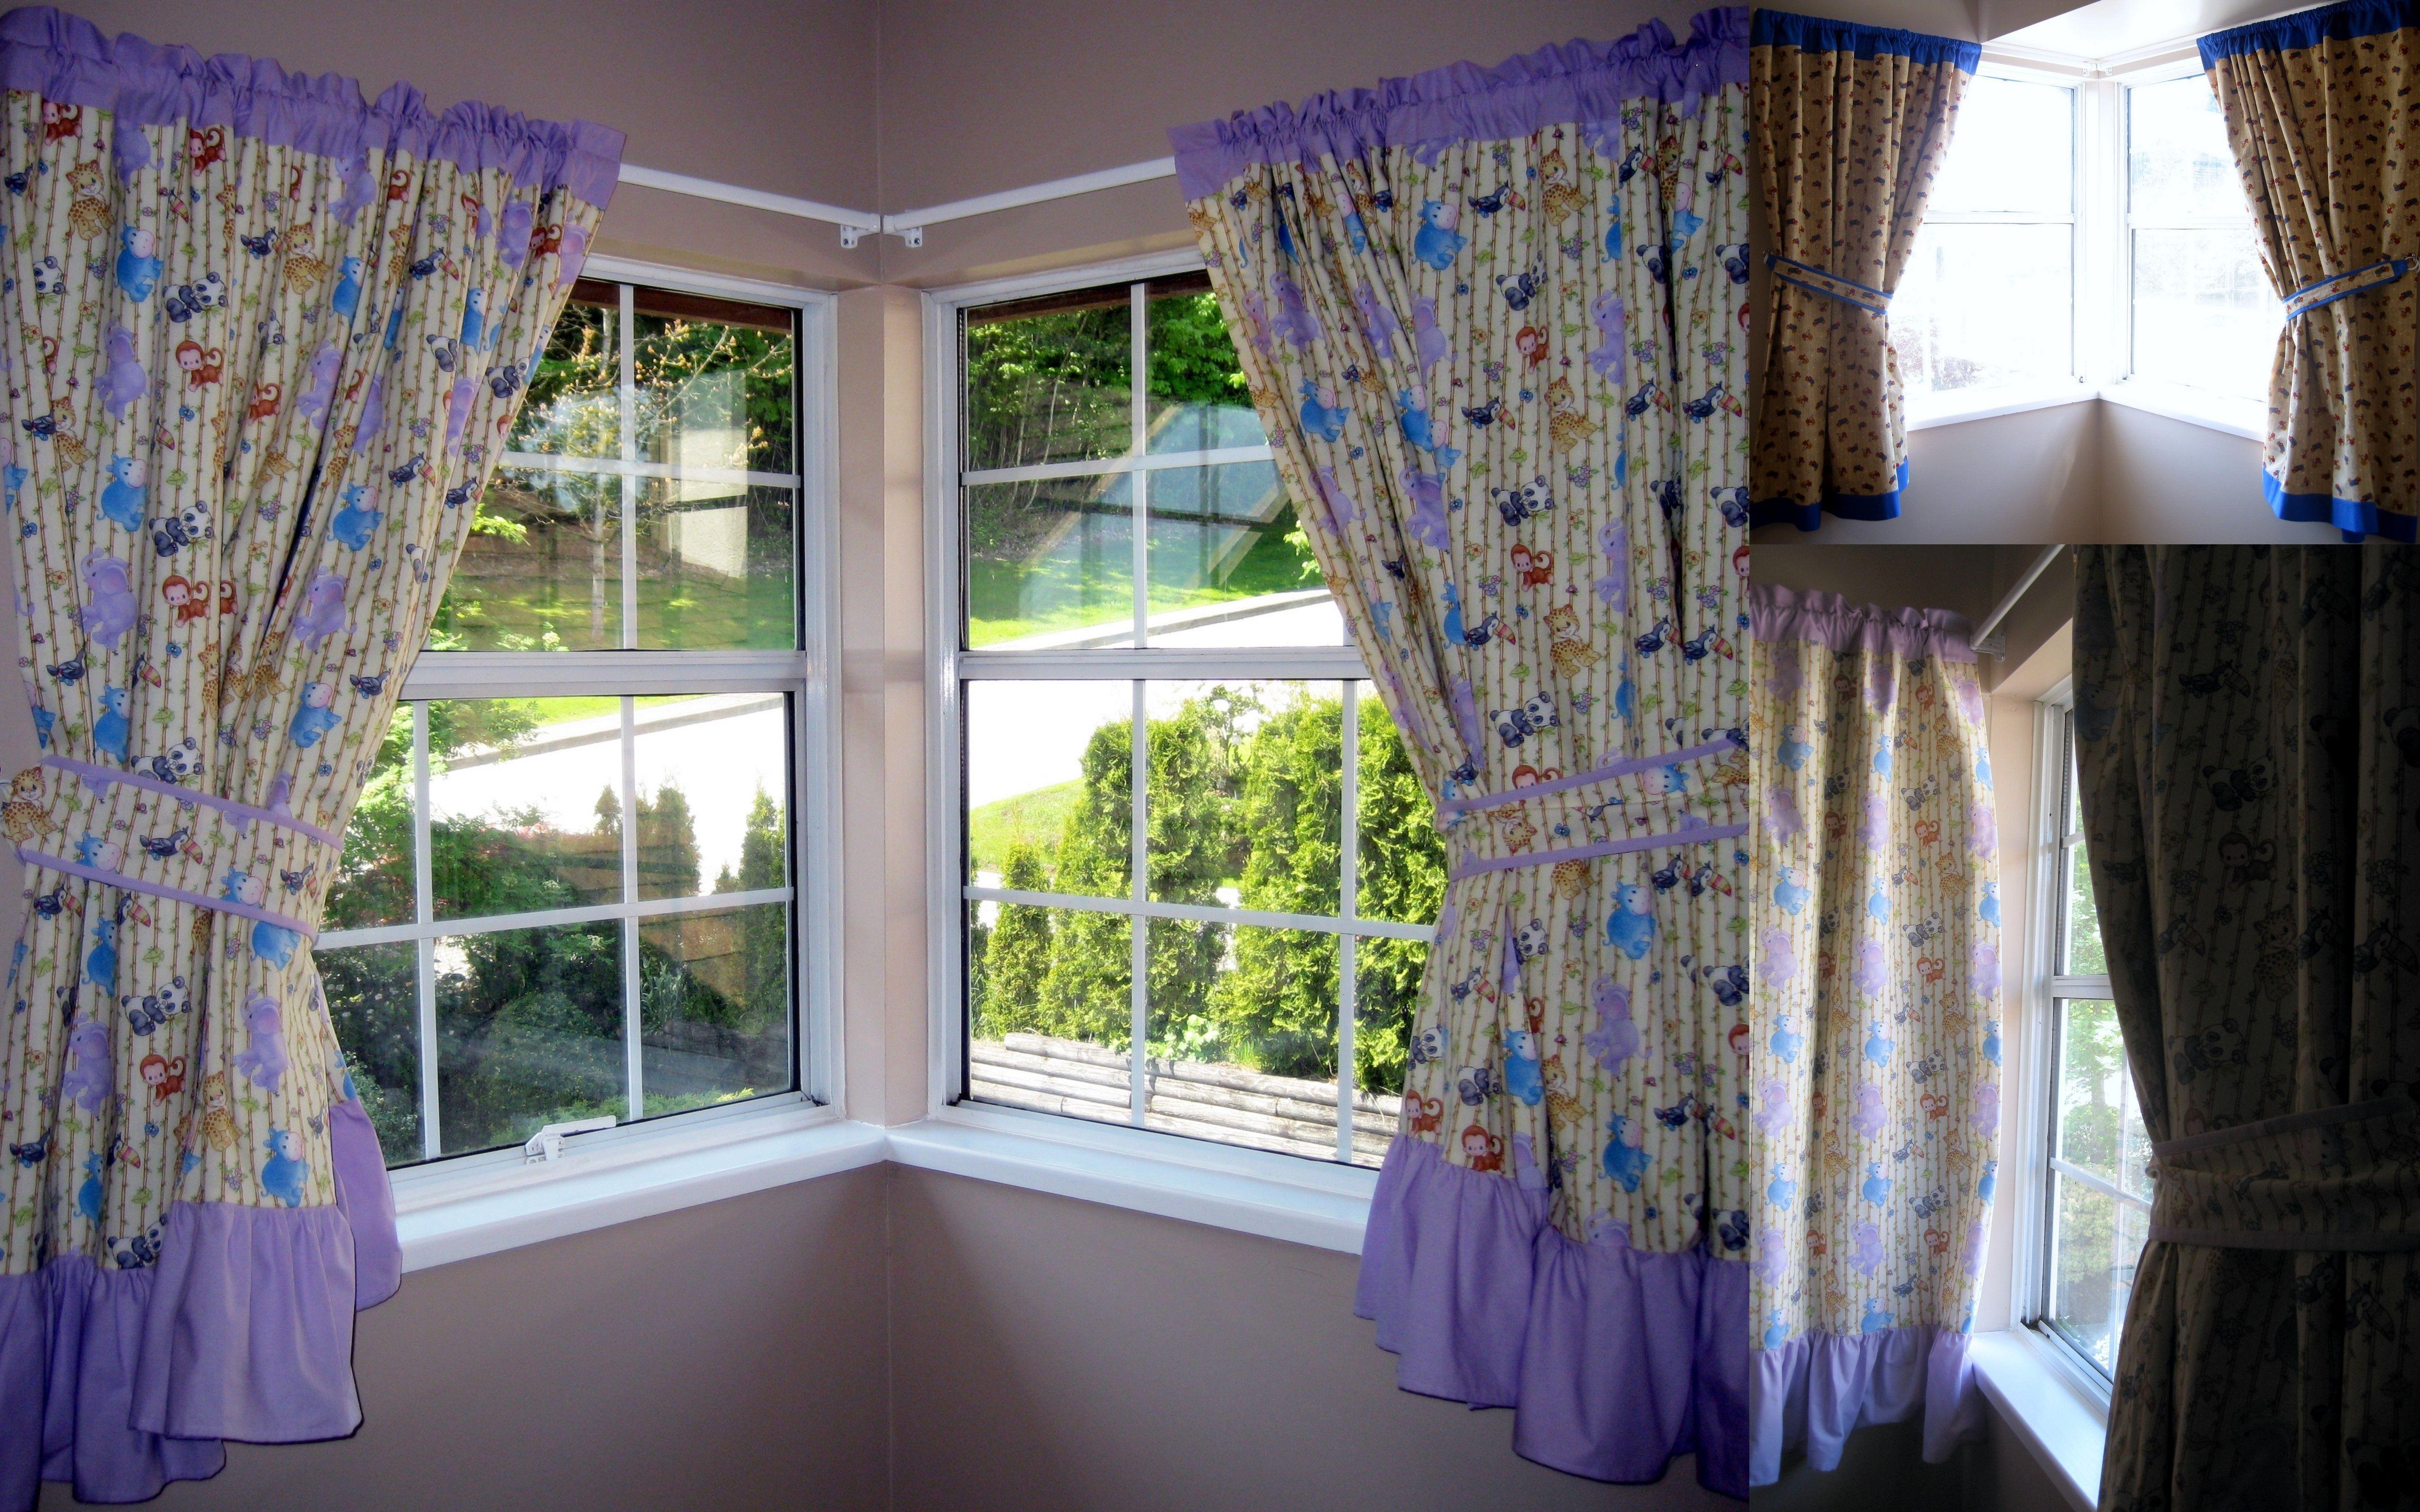 Acryl Gardinenstangen 1 Zoll Gardinenstange Ecke Fenster